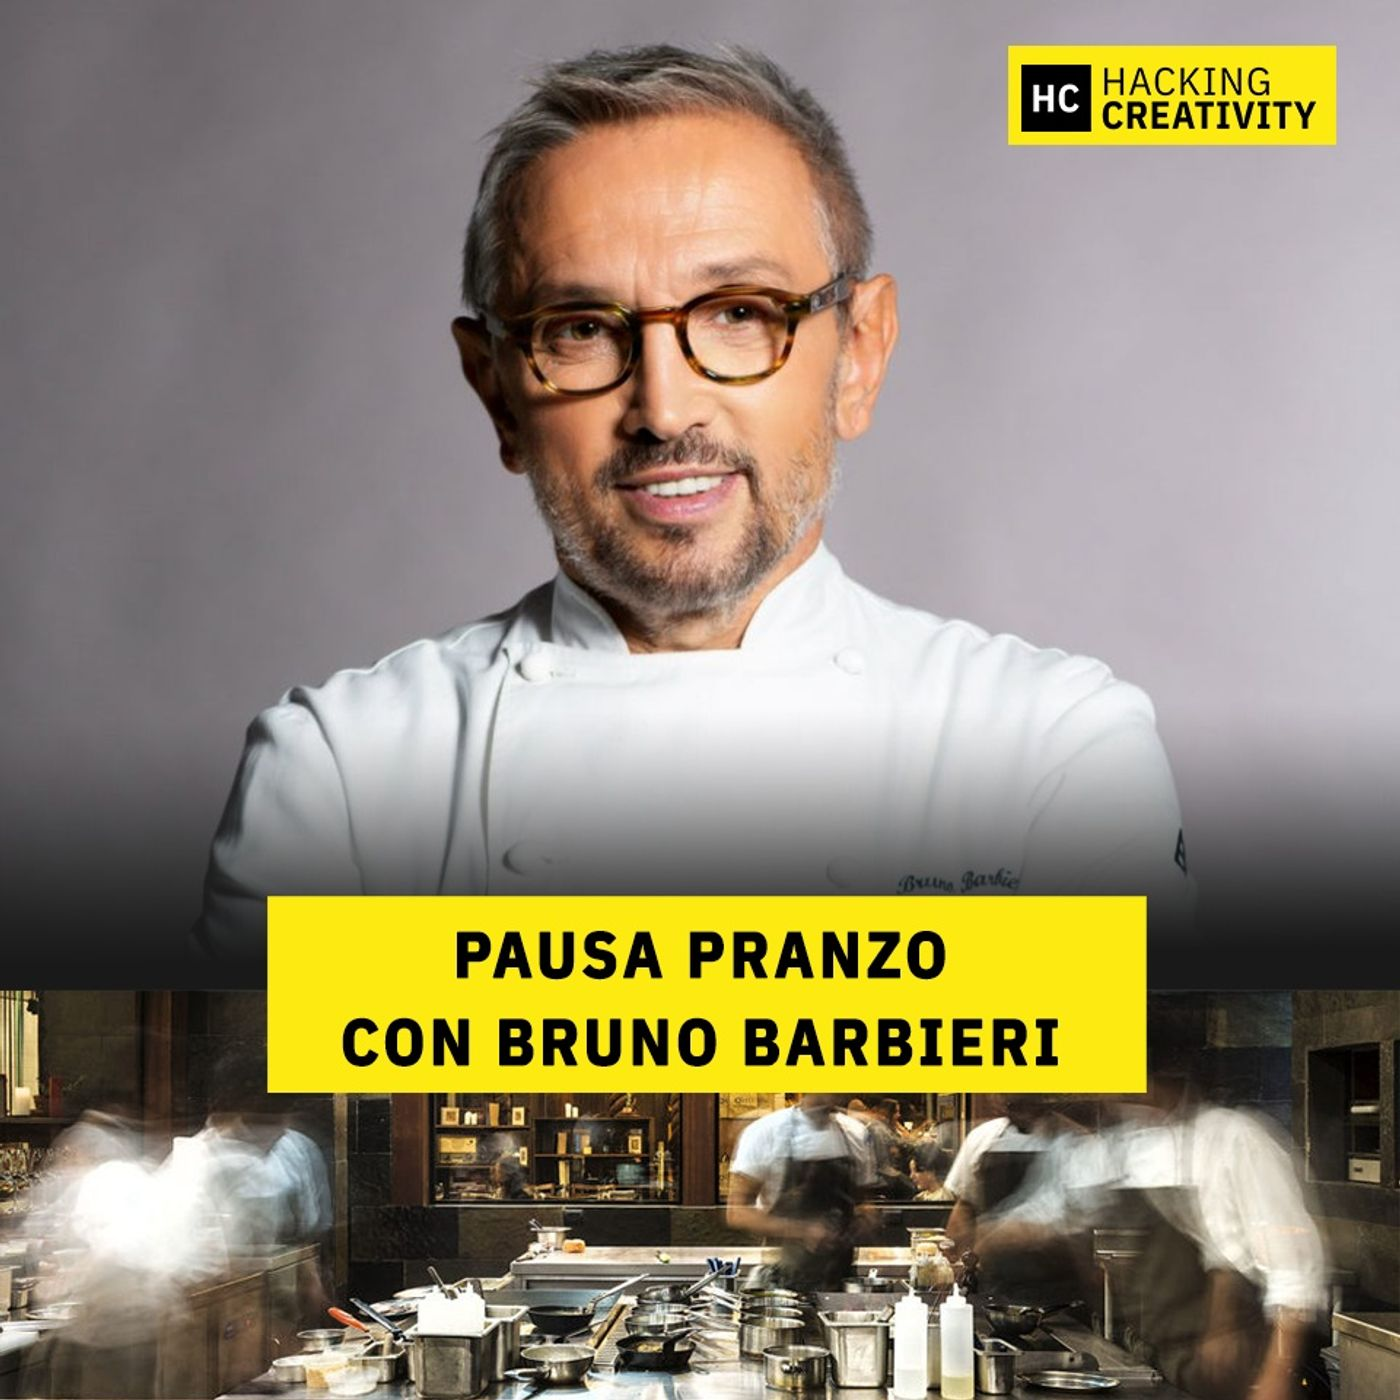 74 - Pausa pranzo con Bruno Barbieri